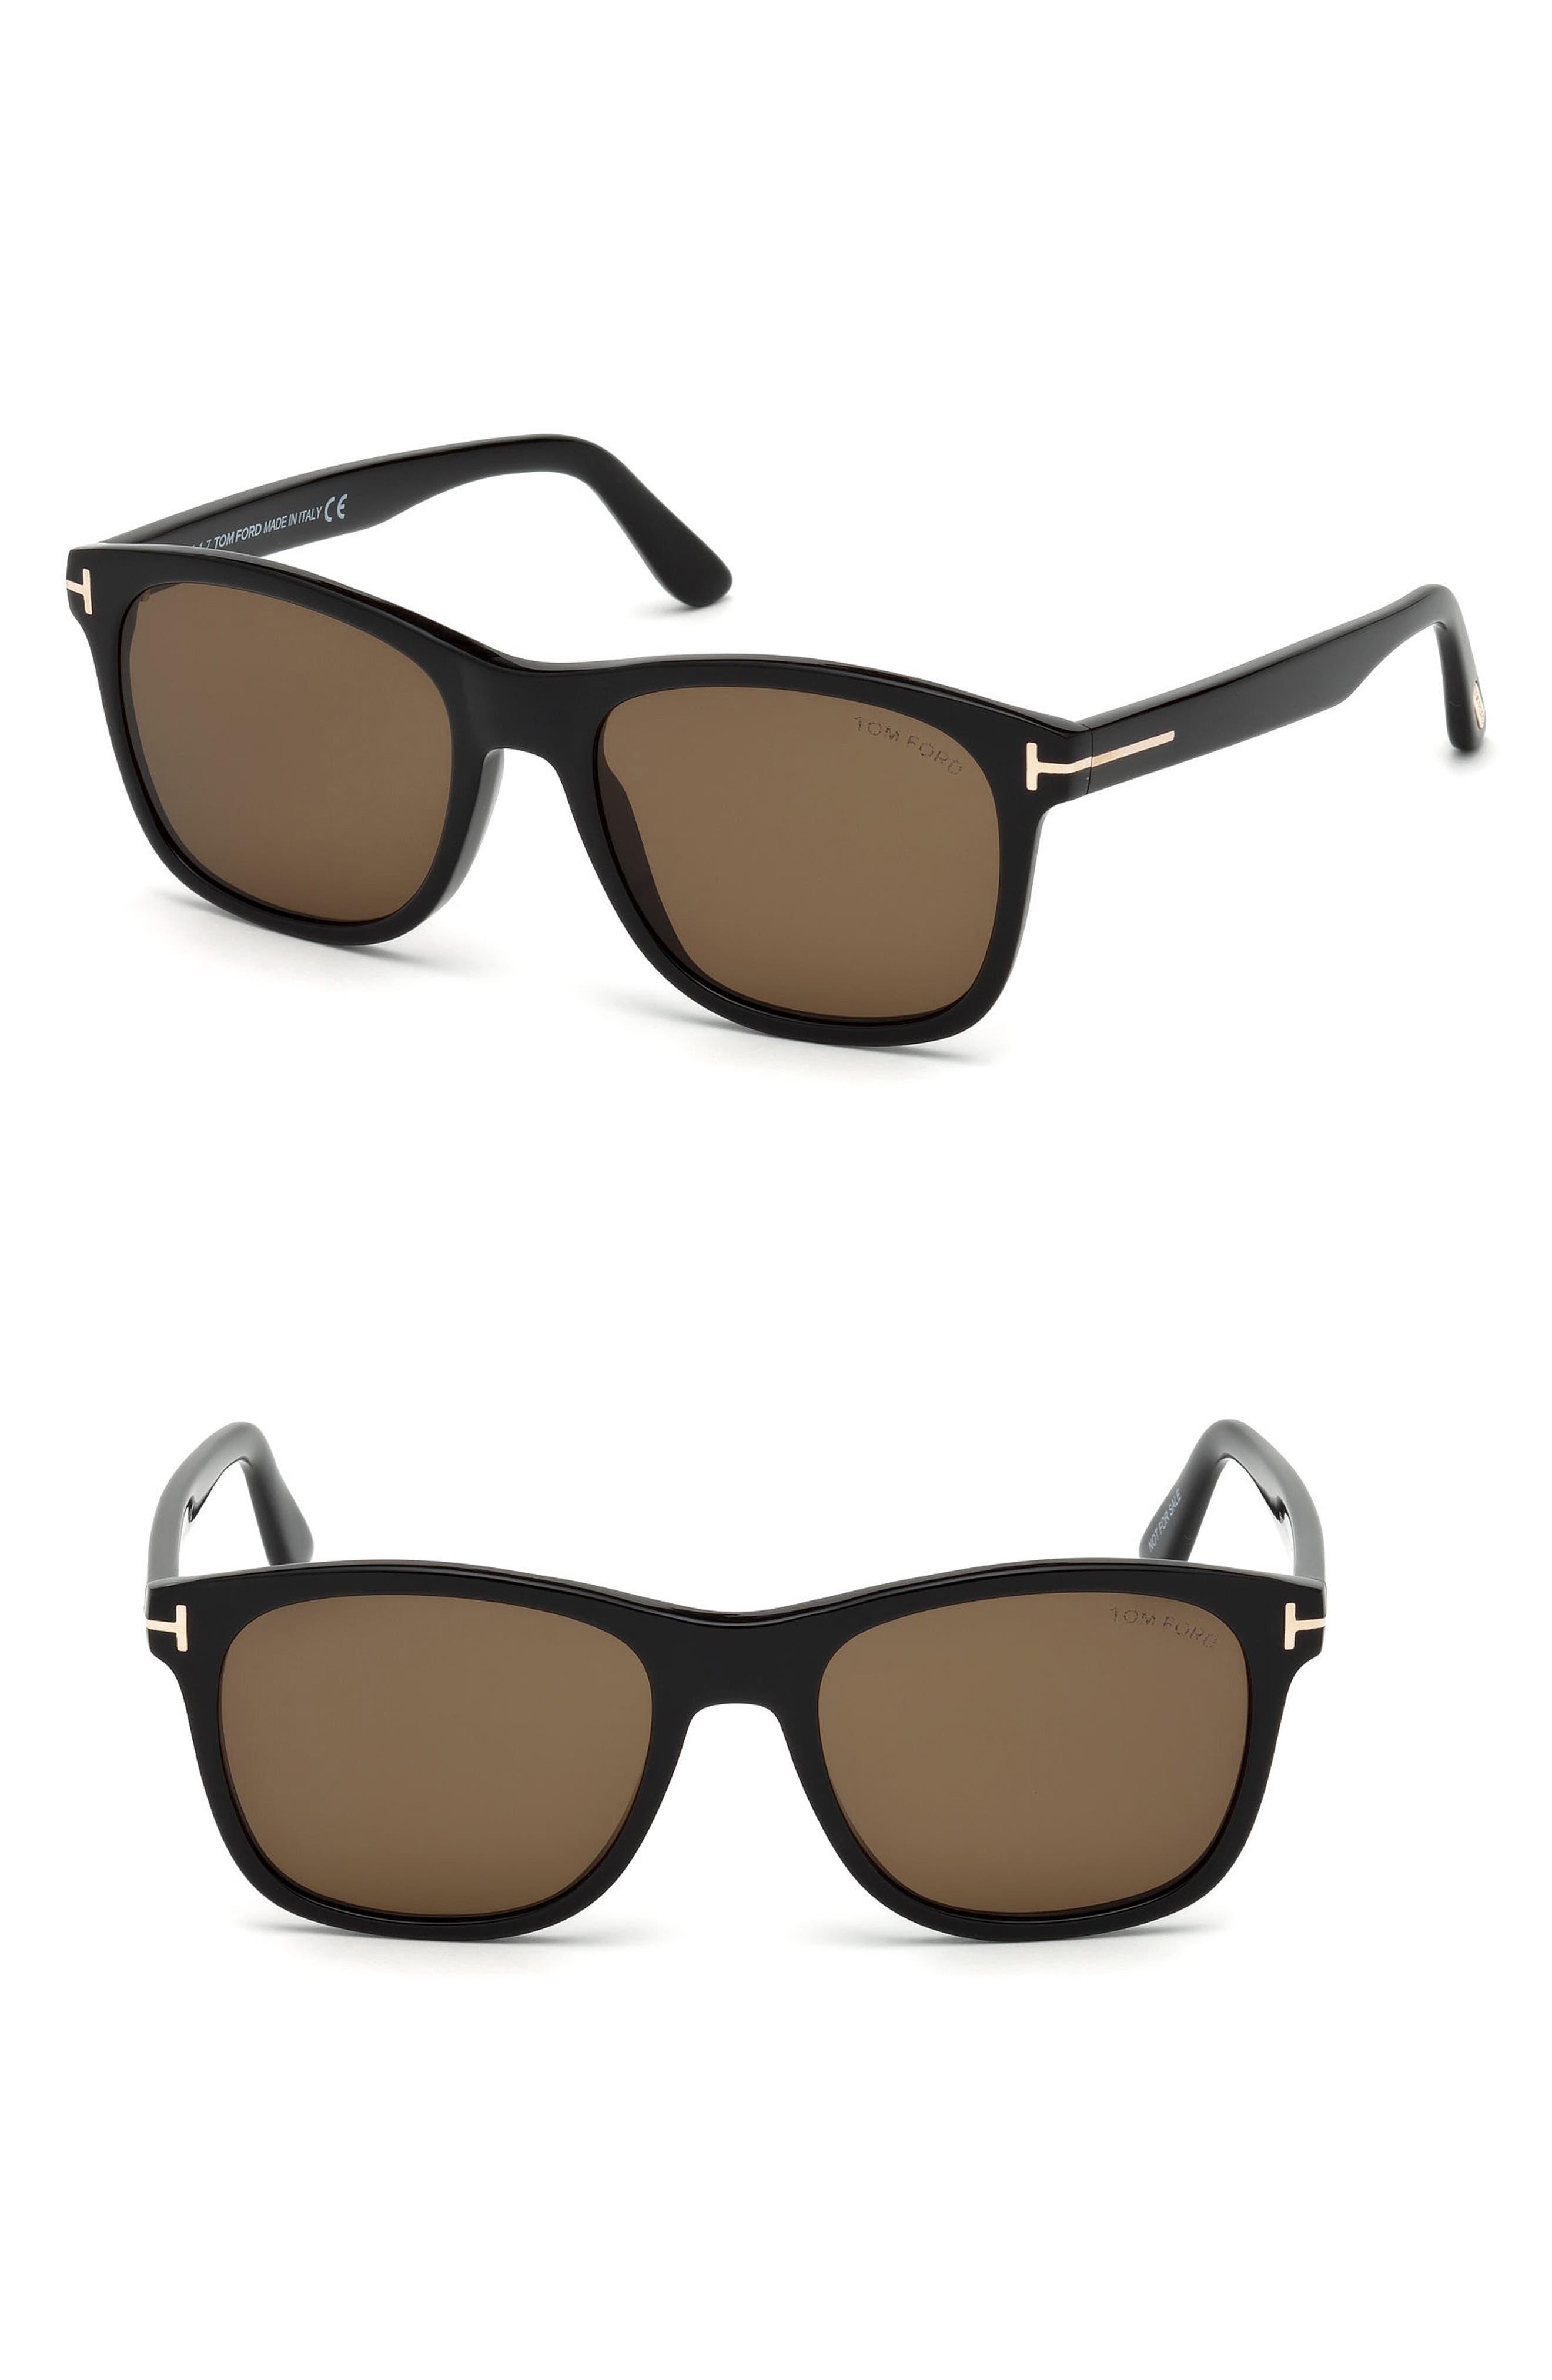 Eric 55mm Sunglasses,                             Main thumbnail 1, color,                             015